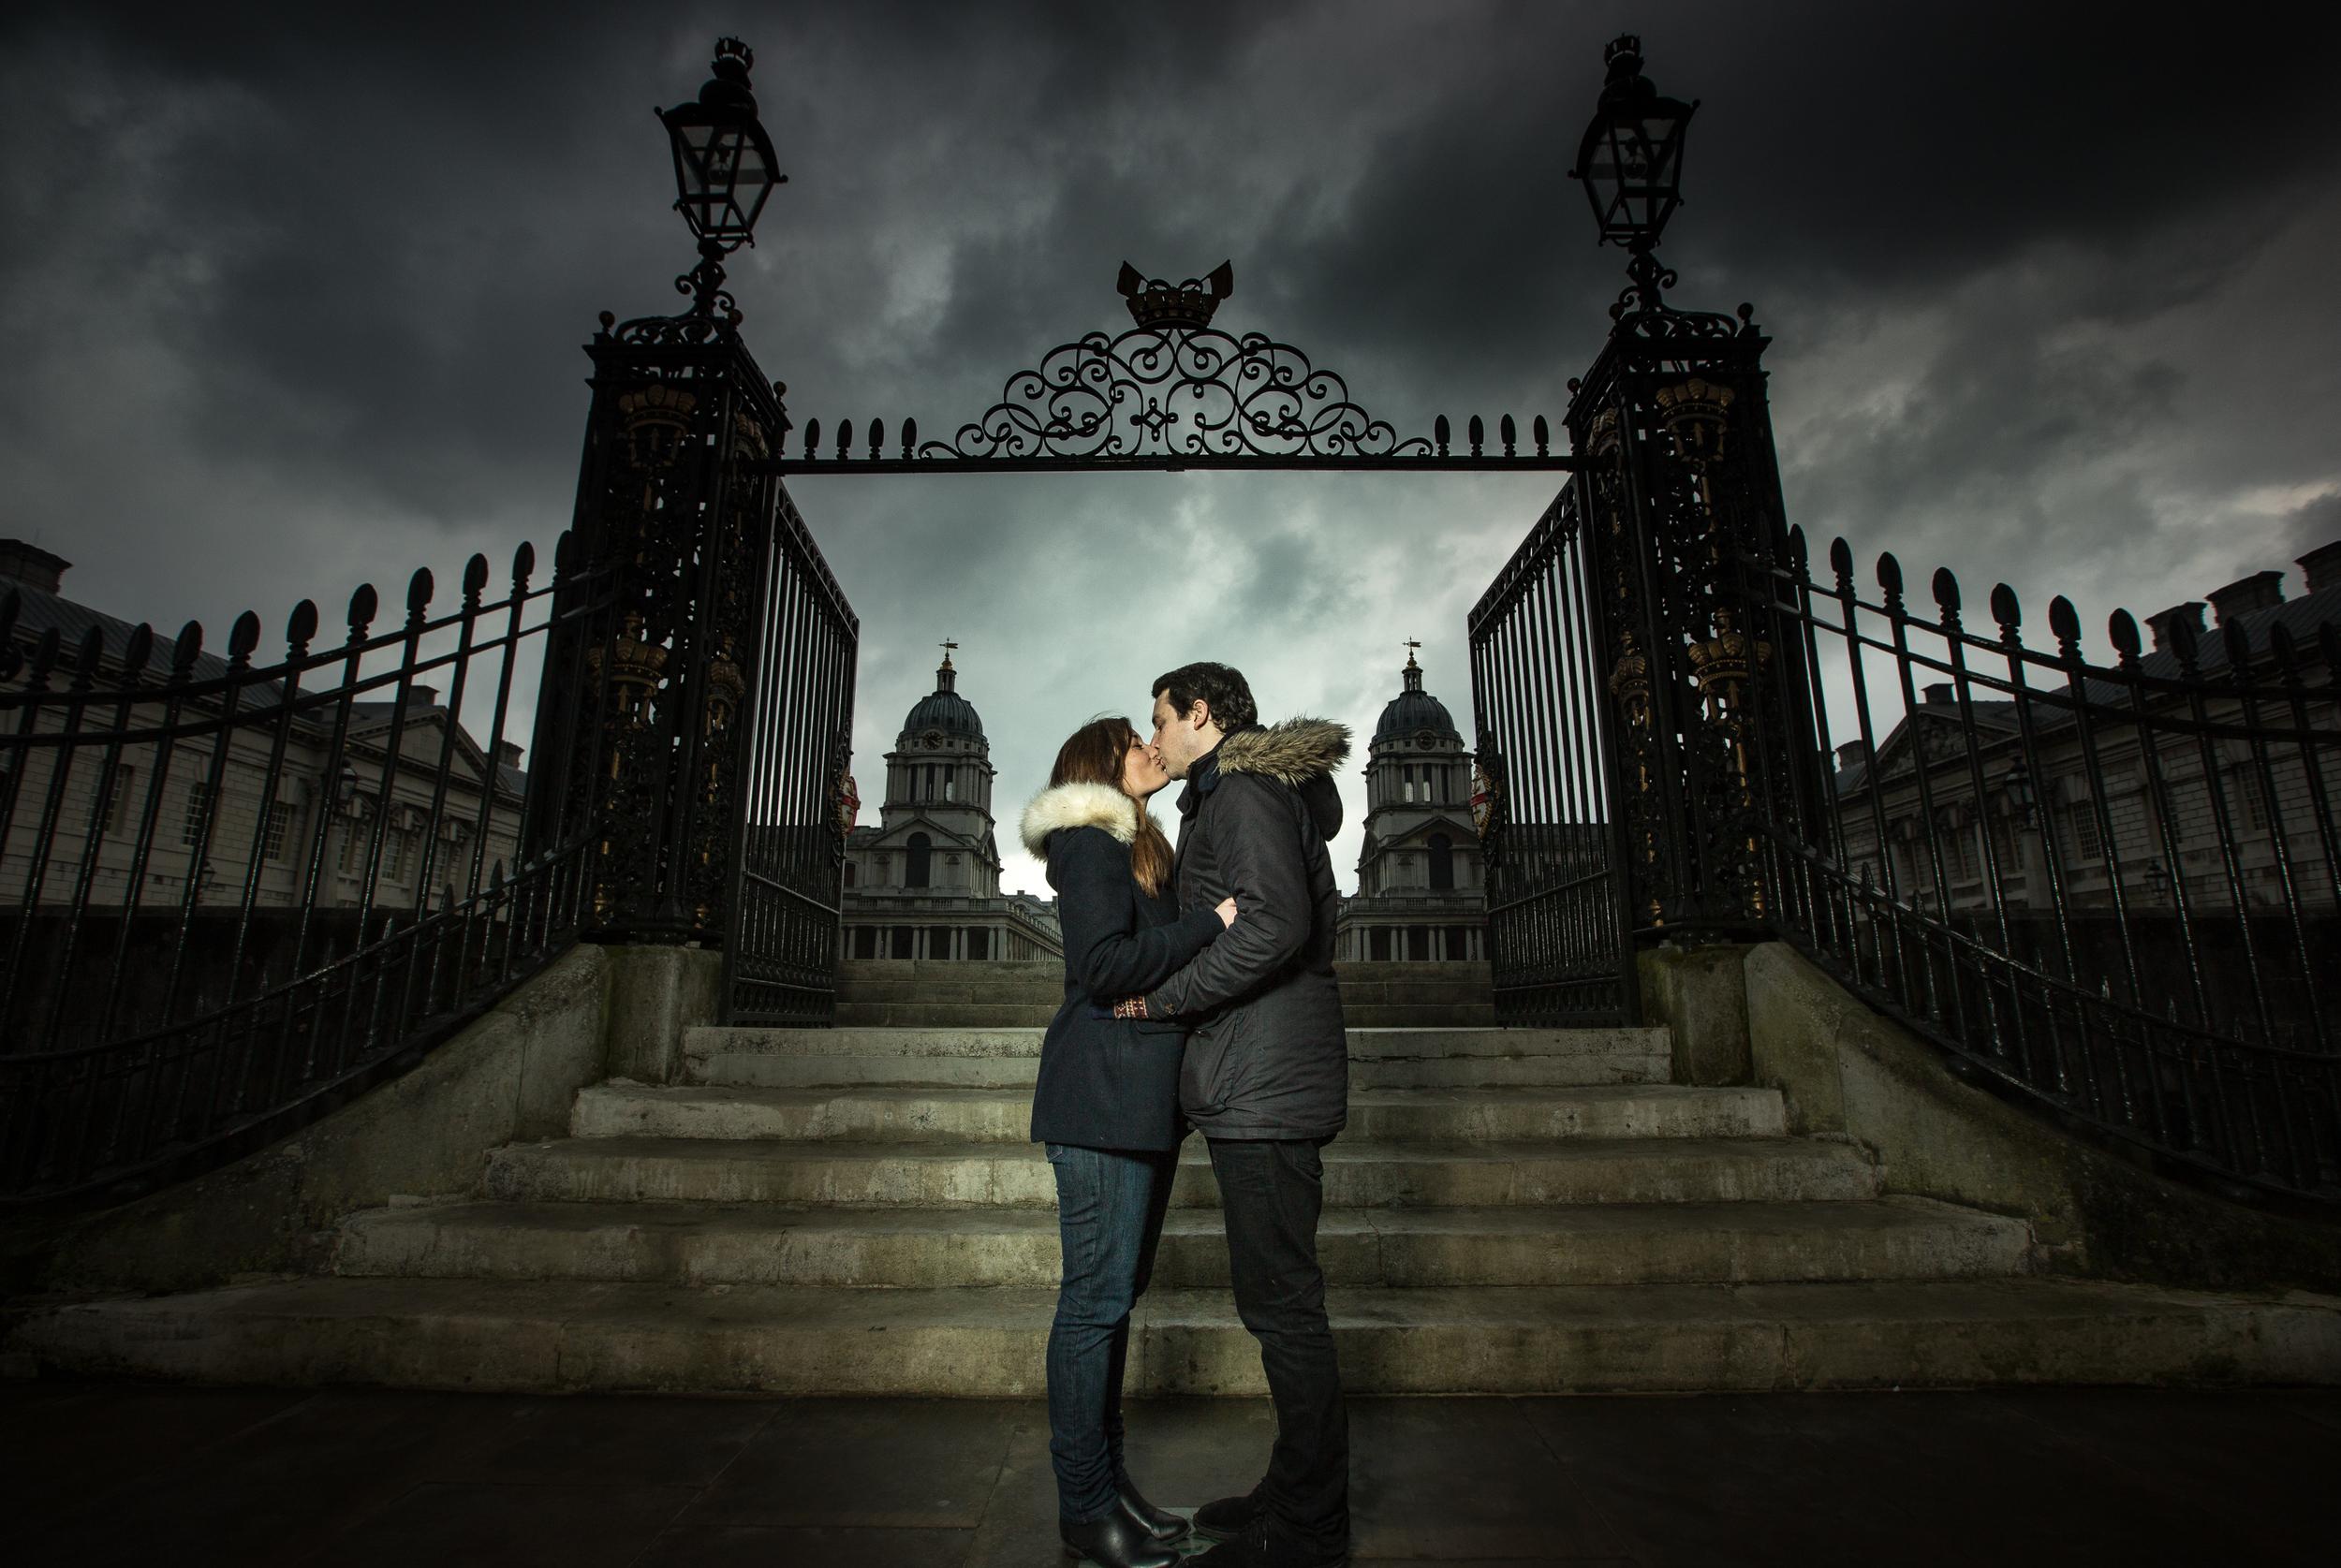 greenwich-royal-naval-academy-engagement-london-uk-destination-wedding-photography-Adam-Rowley